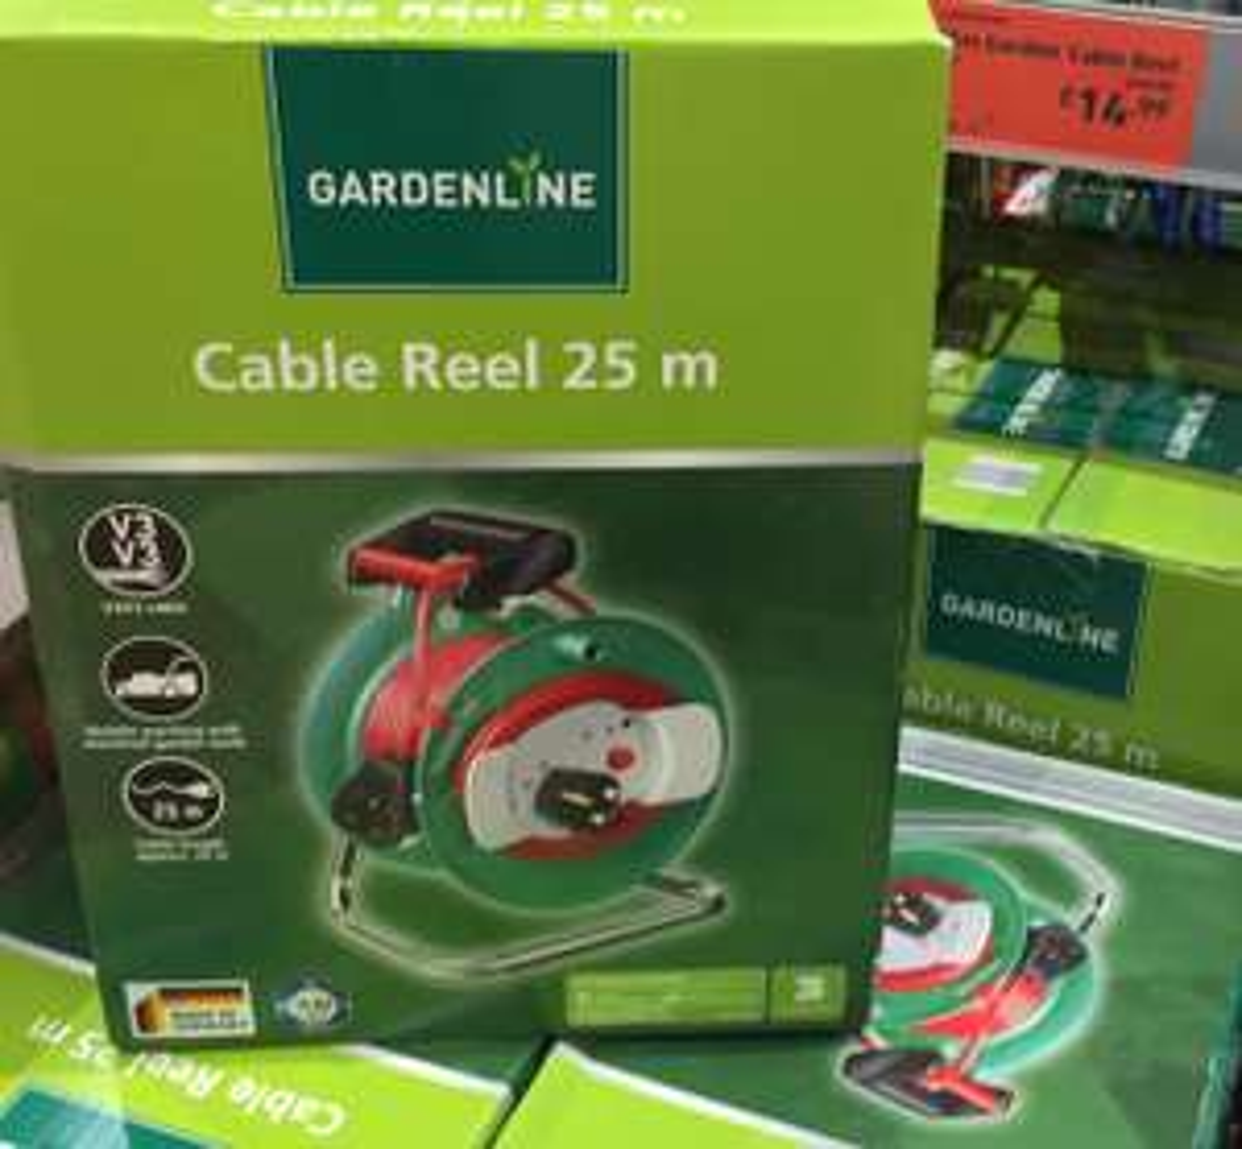 Aldi 25 metre garden cable reel £9.99